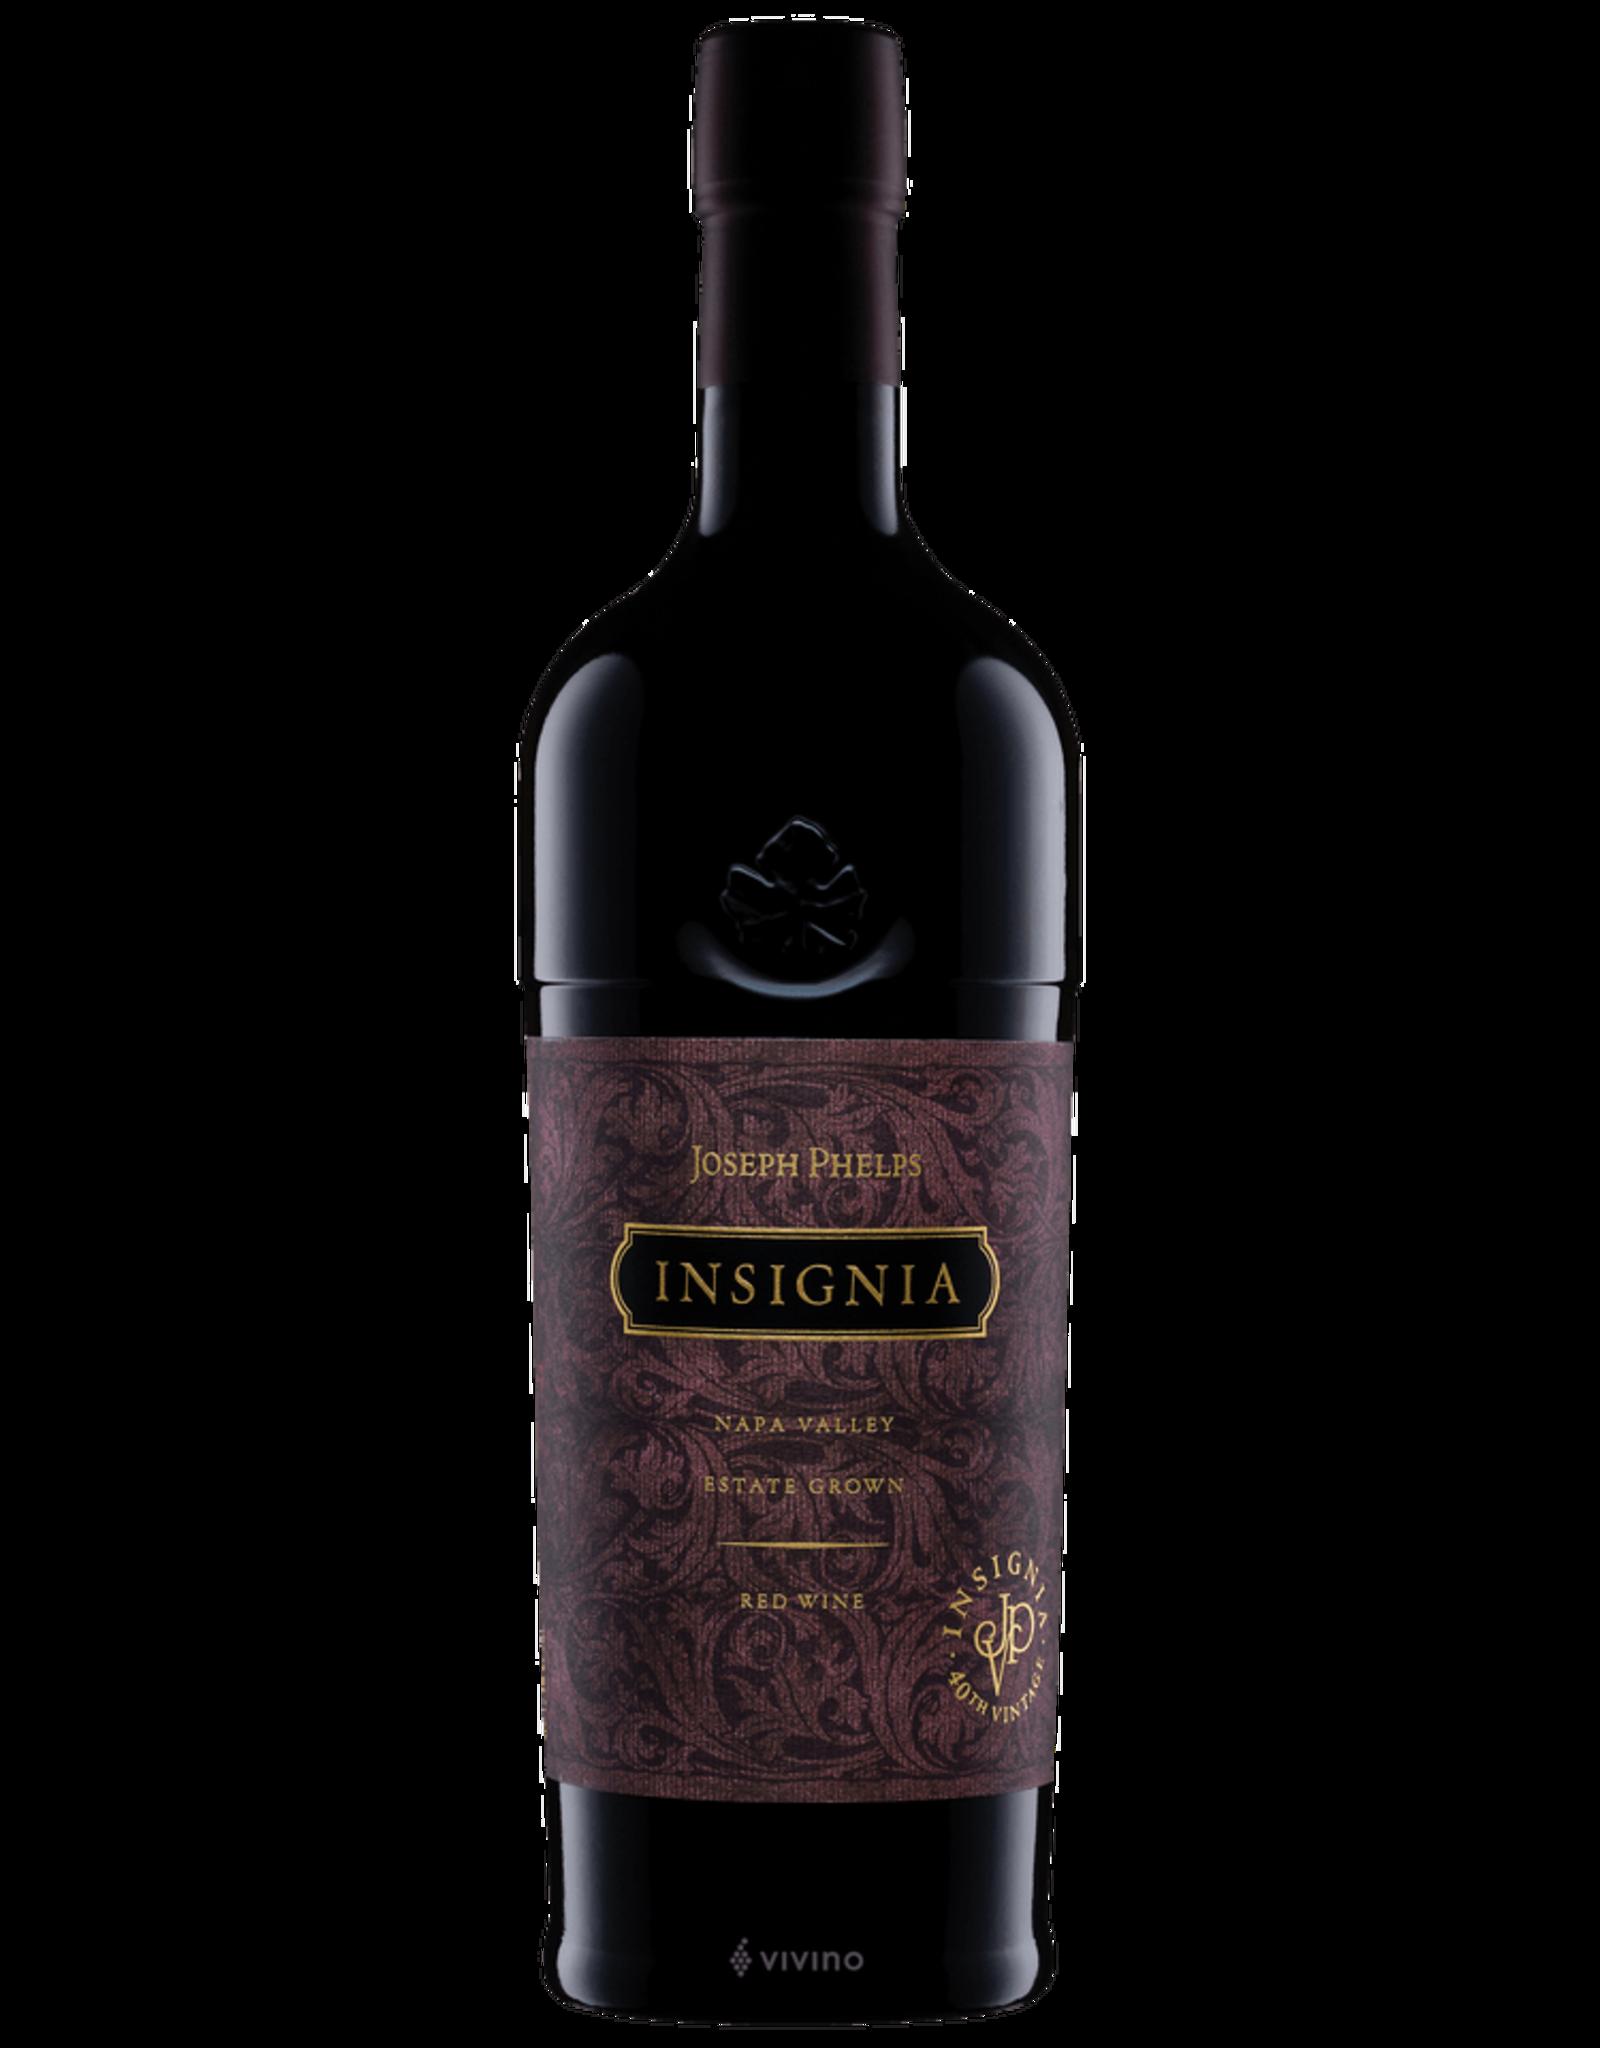 Joseph Phelps 'Insignia' Napa Valley Red Wine 2016